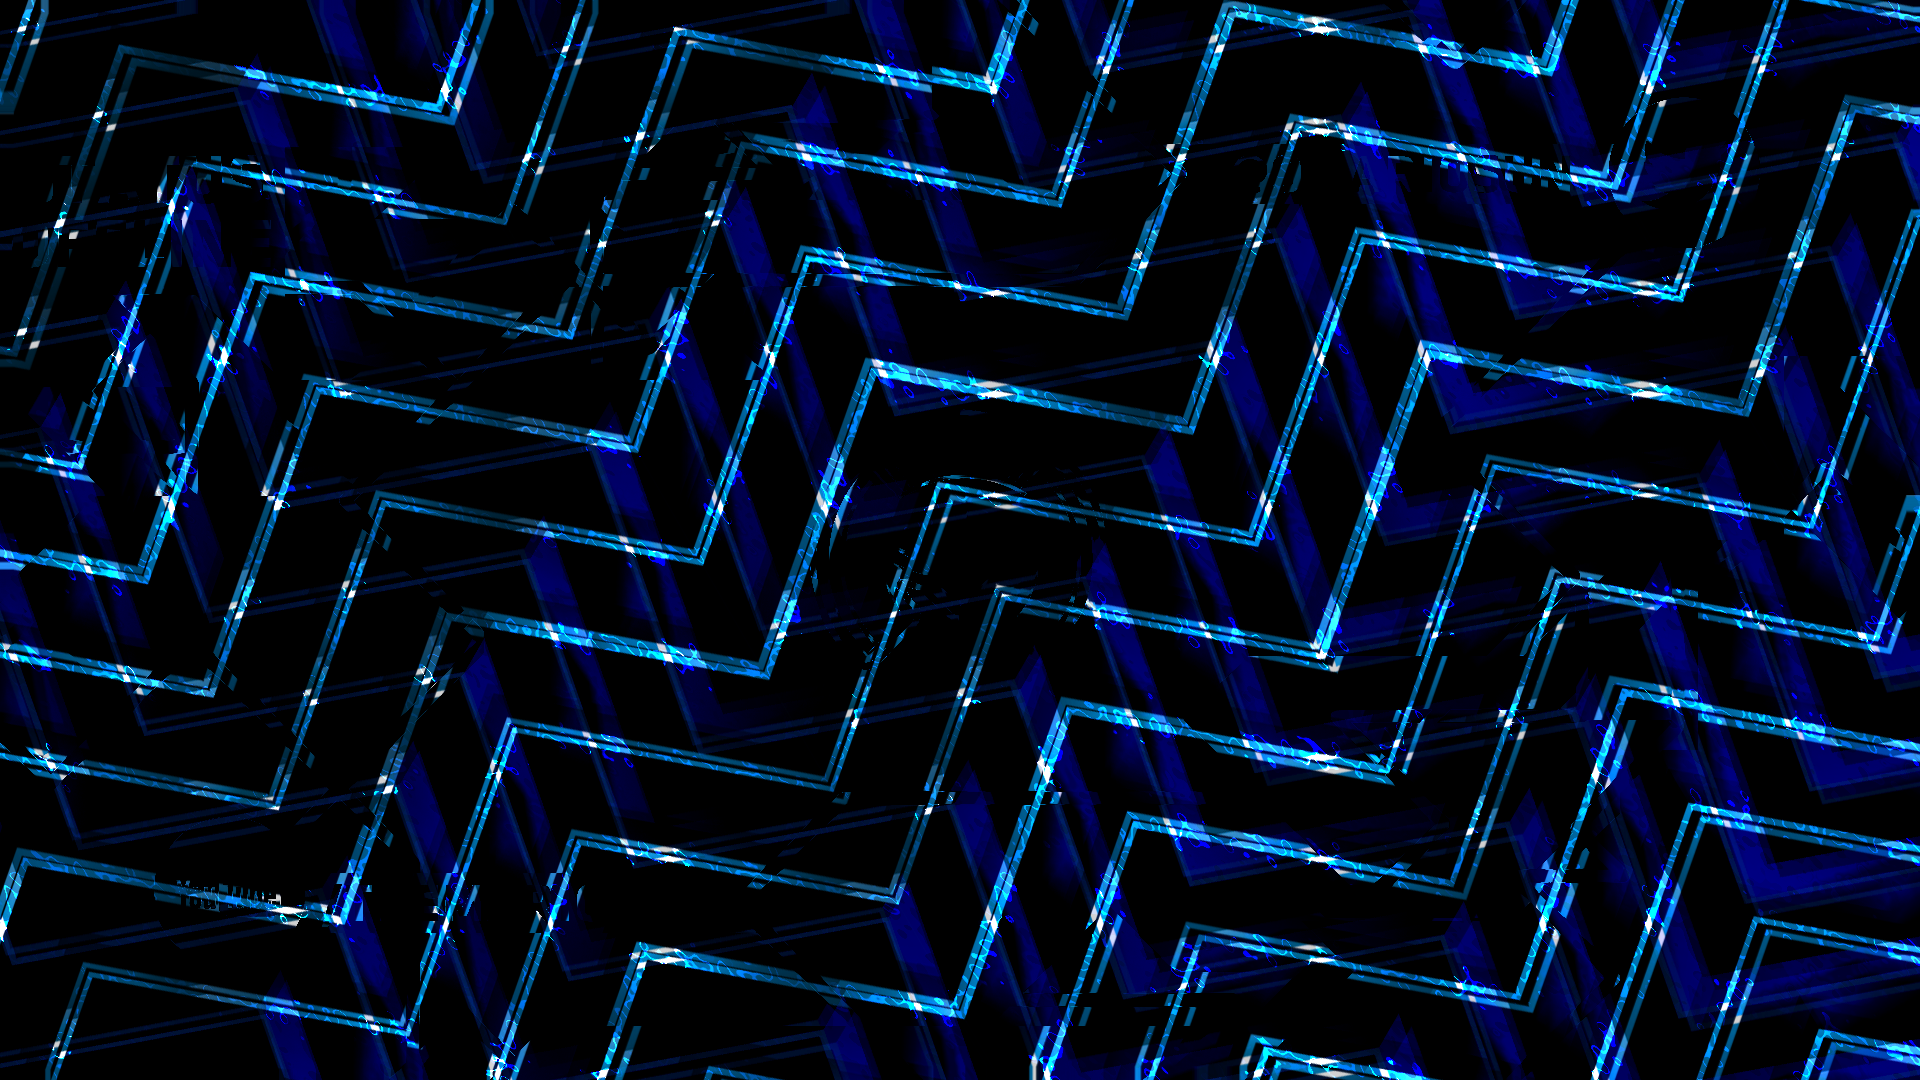 General 1920x1080 lines abstract blue digital art